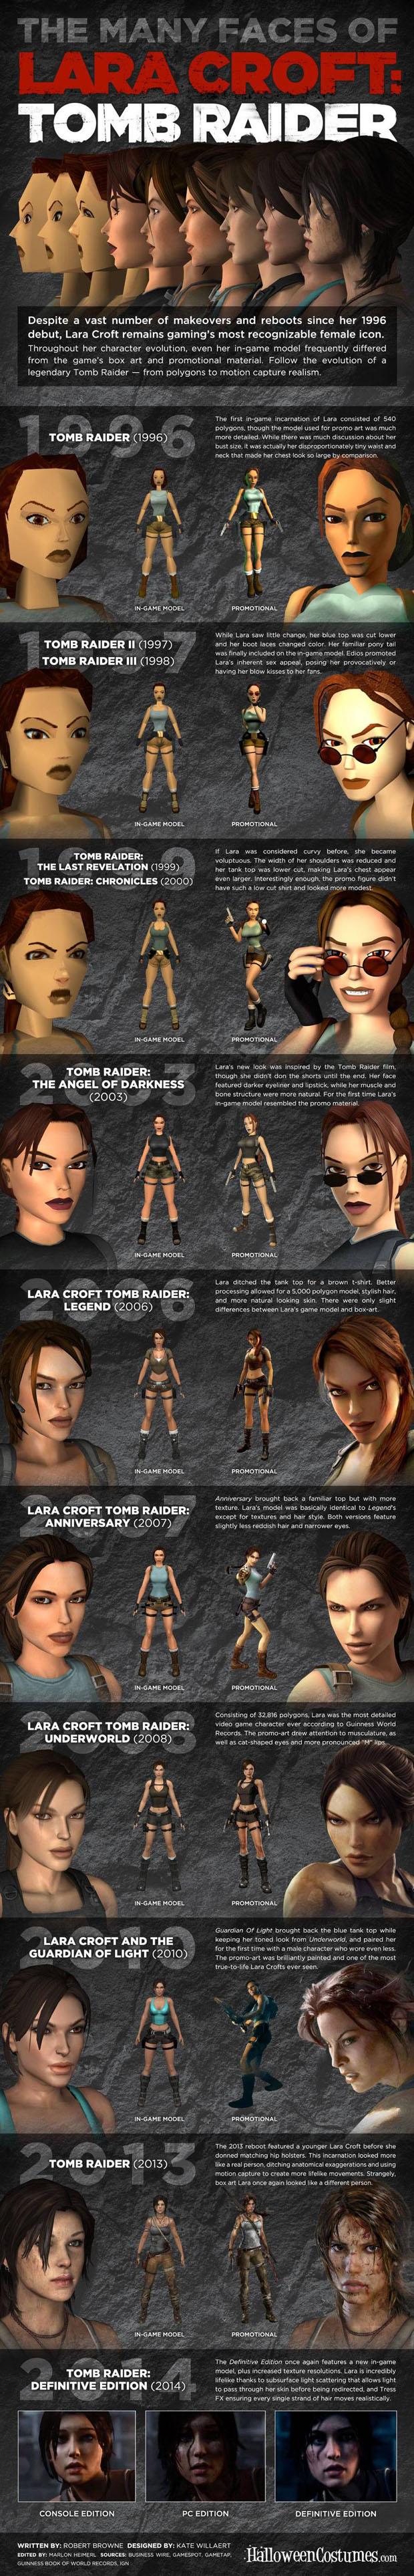 lara-croft-models-infographic